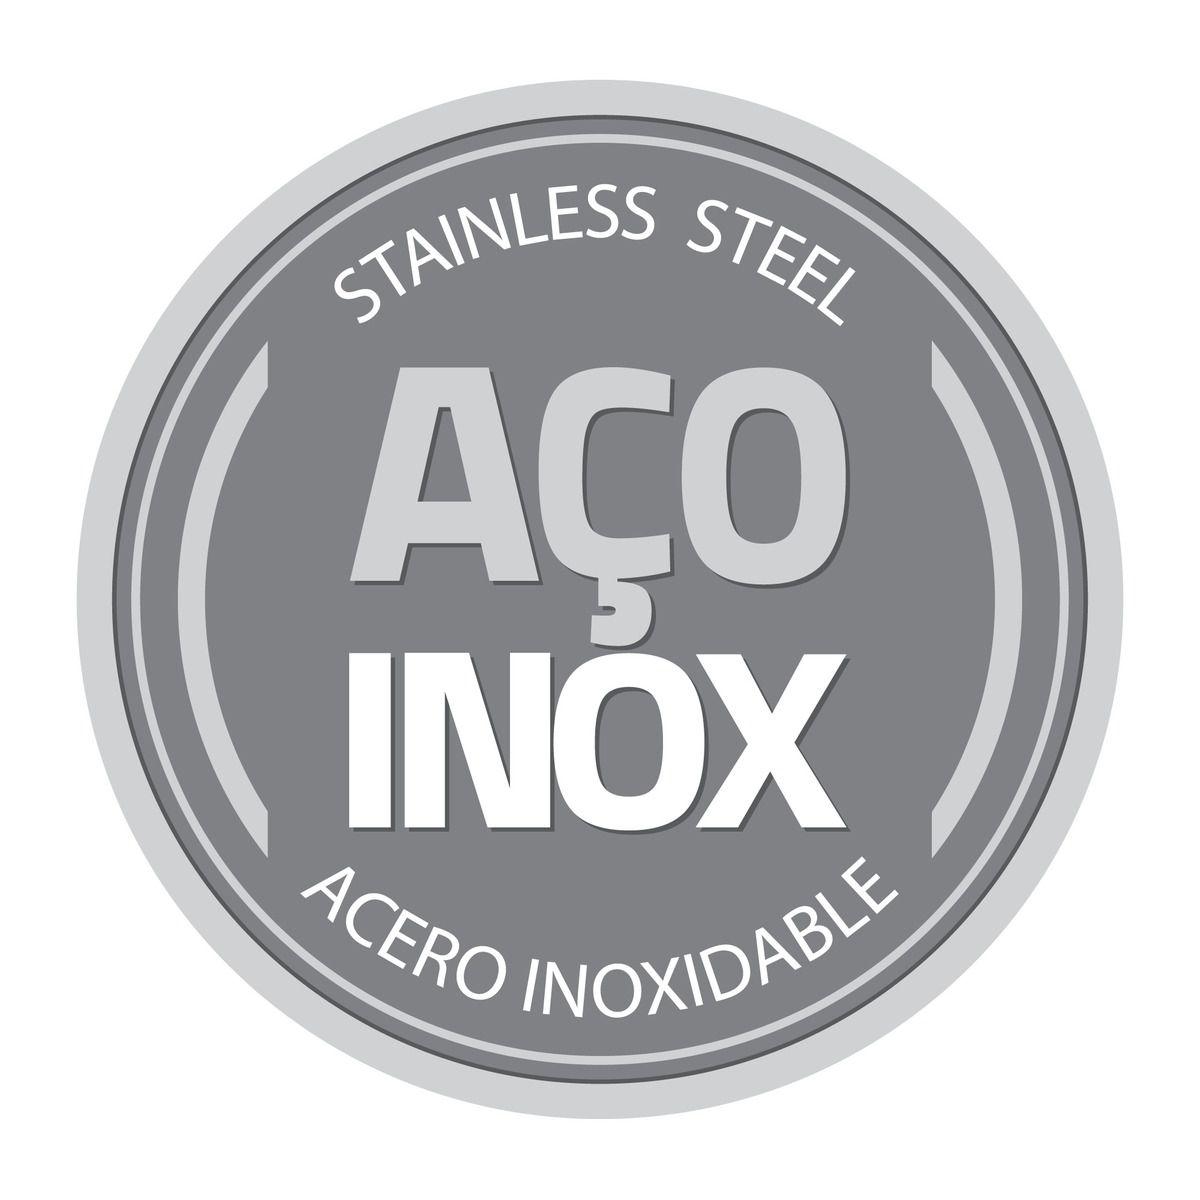 Kit para Sorvete Tramontina Service em Aço Inox 12 Peças 64400/710 | Lojas Estrela